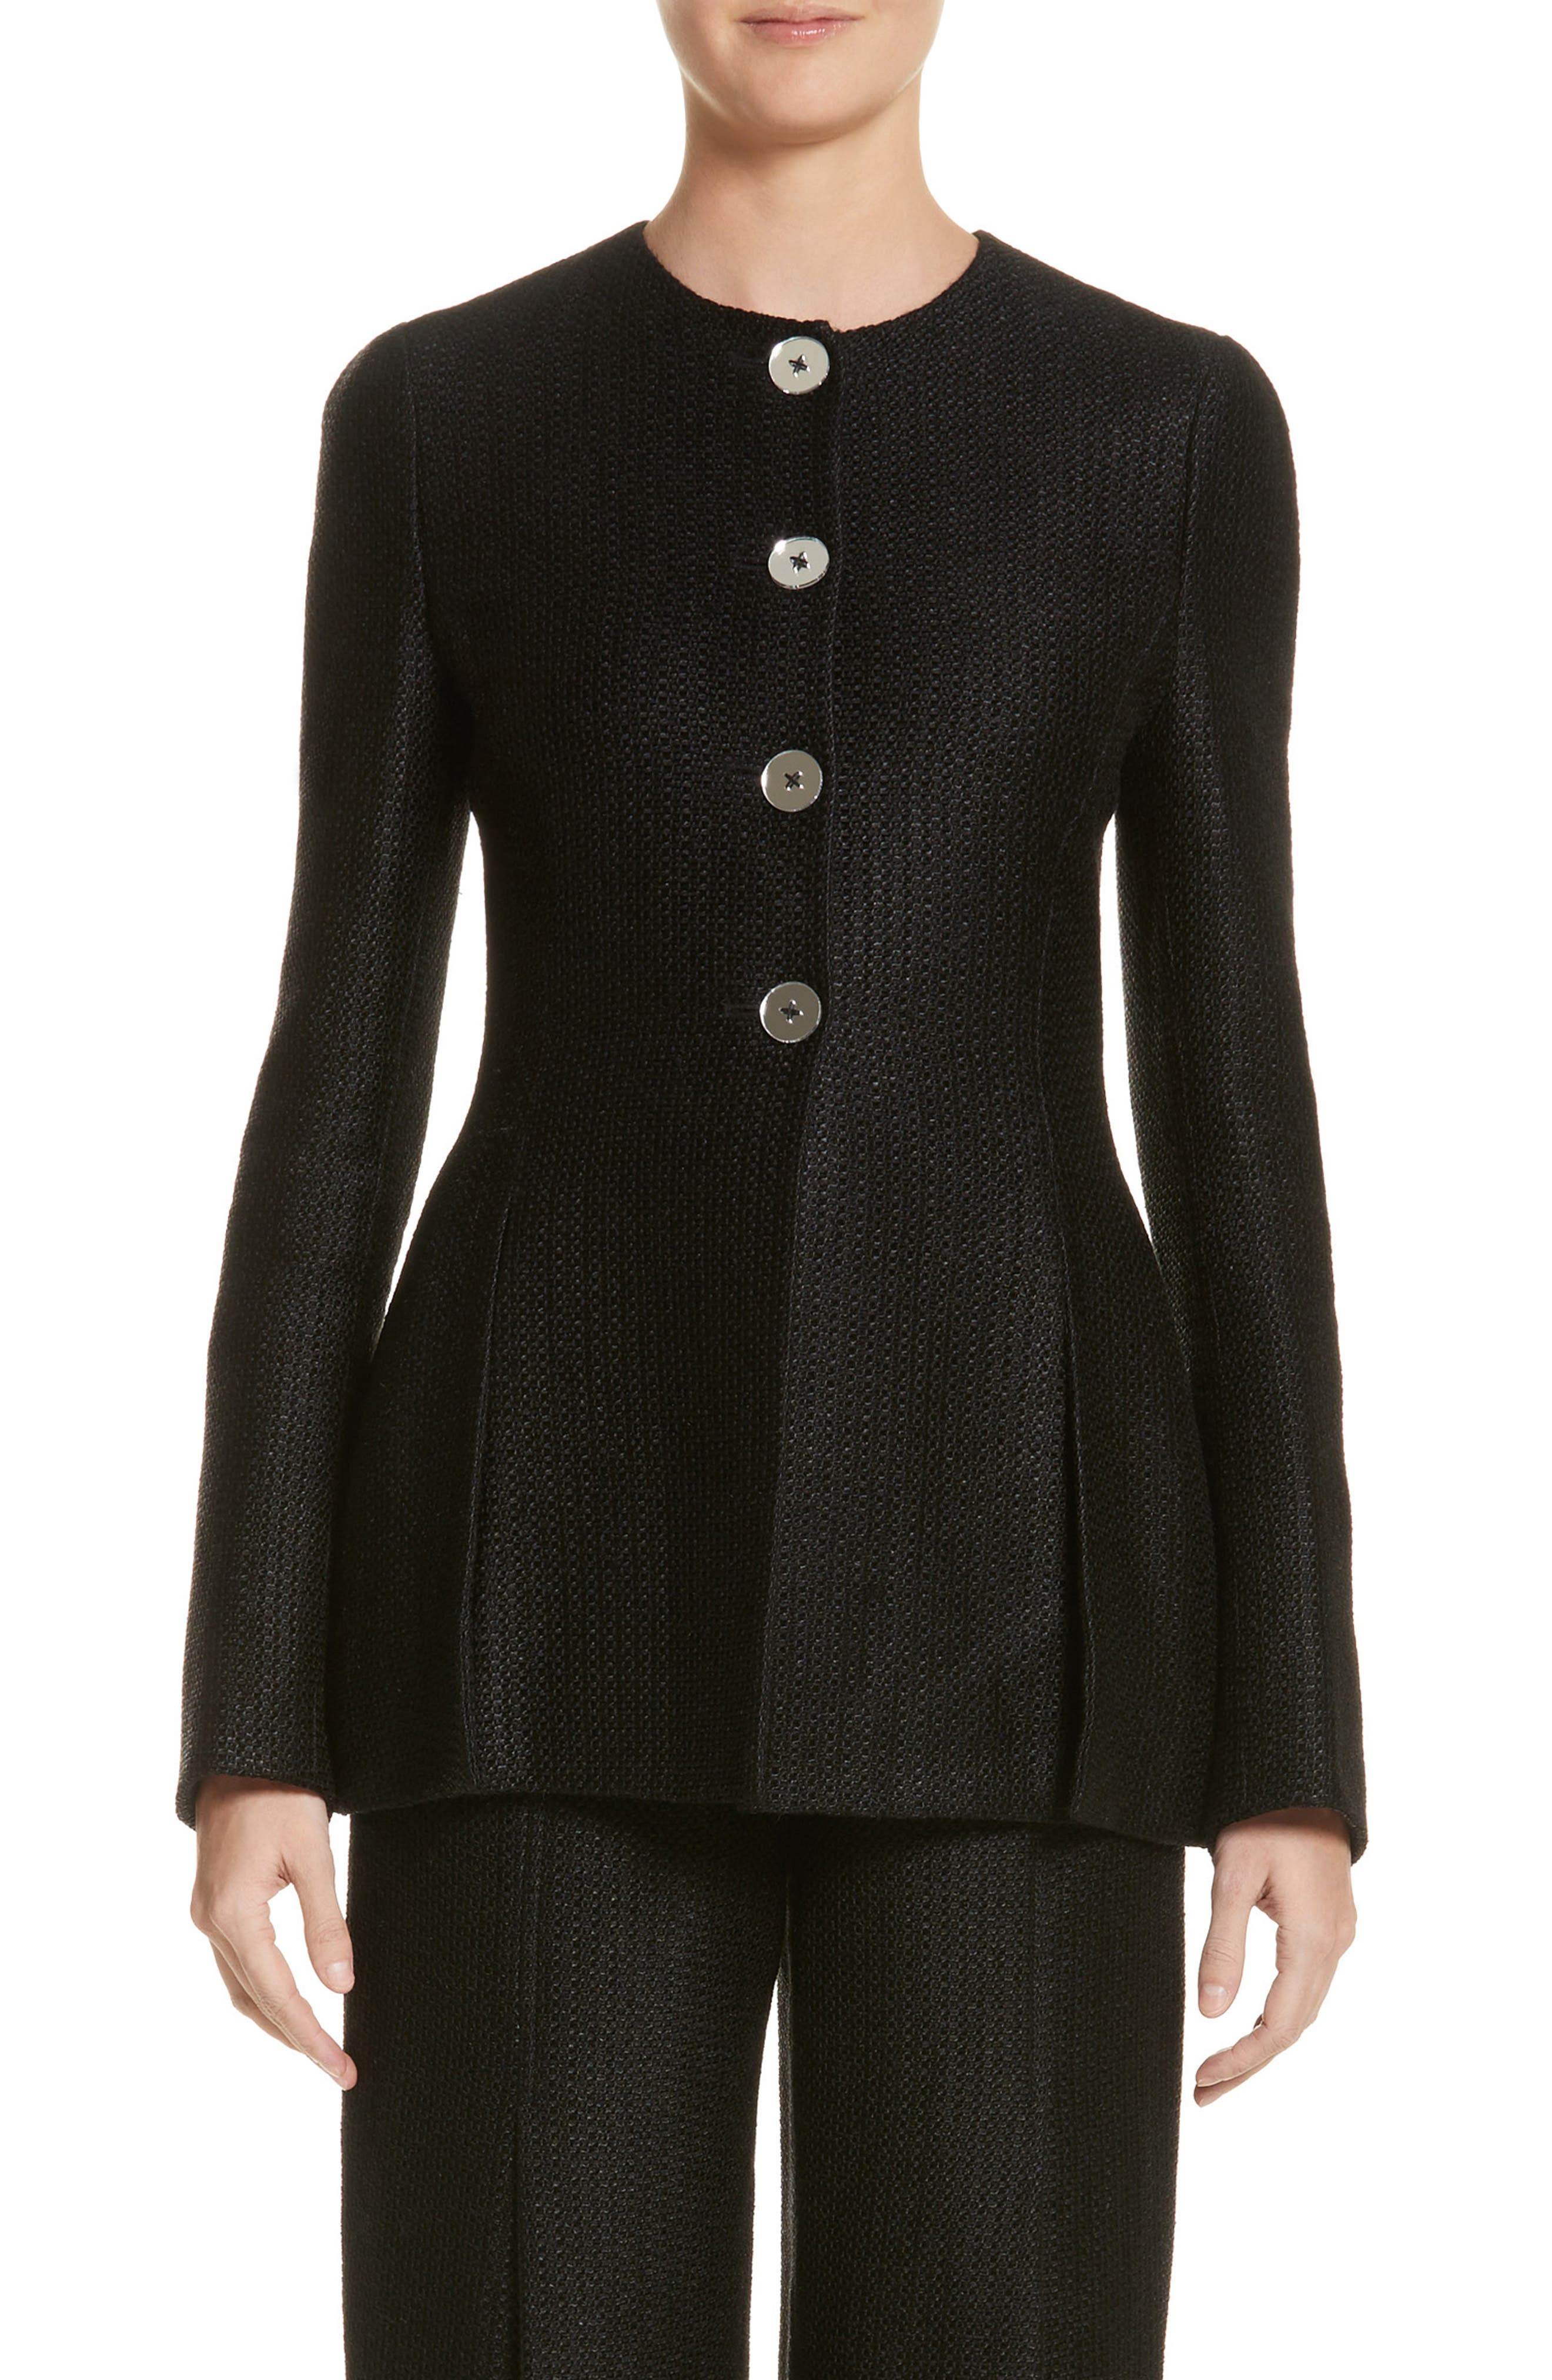 Linen & Silk Blend Tweed Jacket,                             Main thumbnail 1, color,                             001